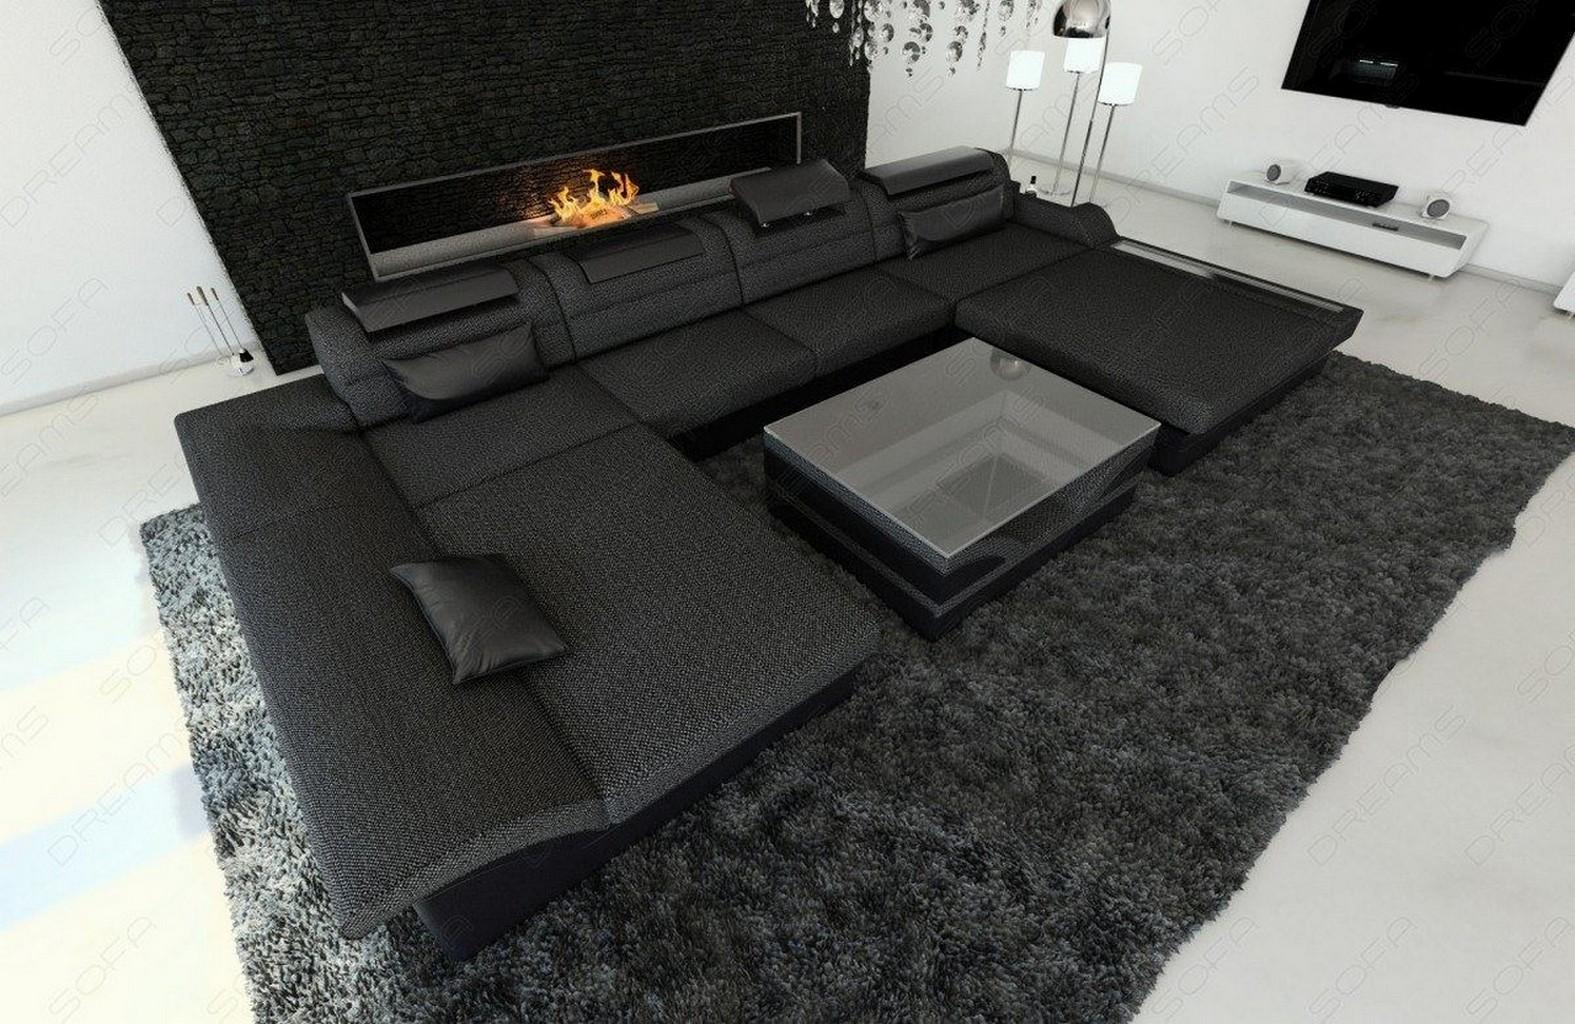 wohnlandschaft design stoff monza u form grau luxus couch sofa led beleuchtung ebay. Black Bedroom Furniture Sets. Home Design Ideas